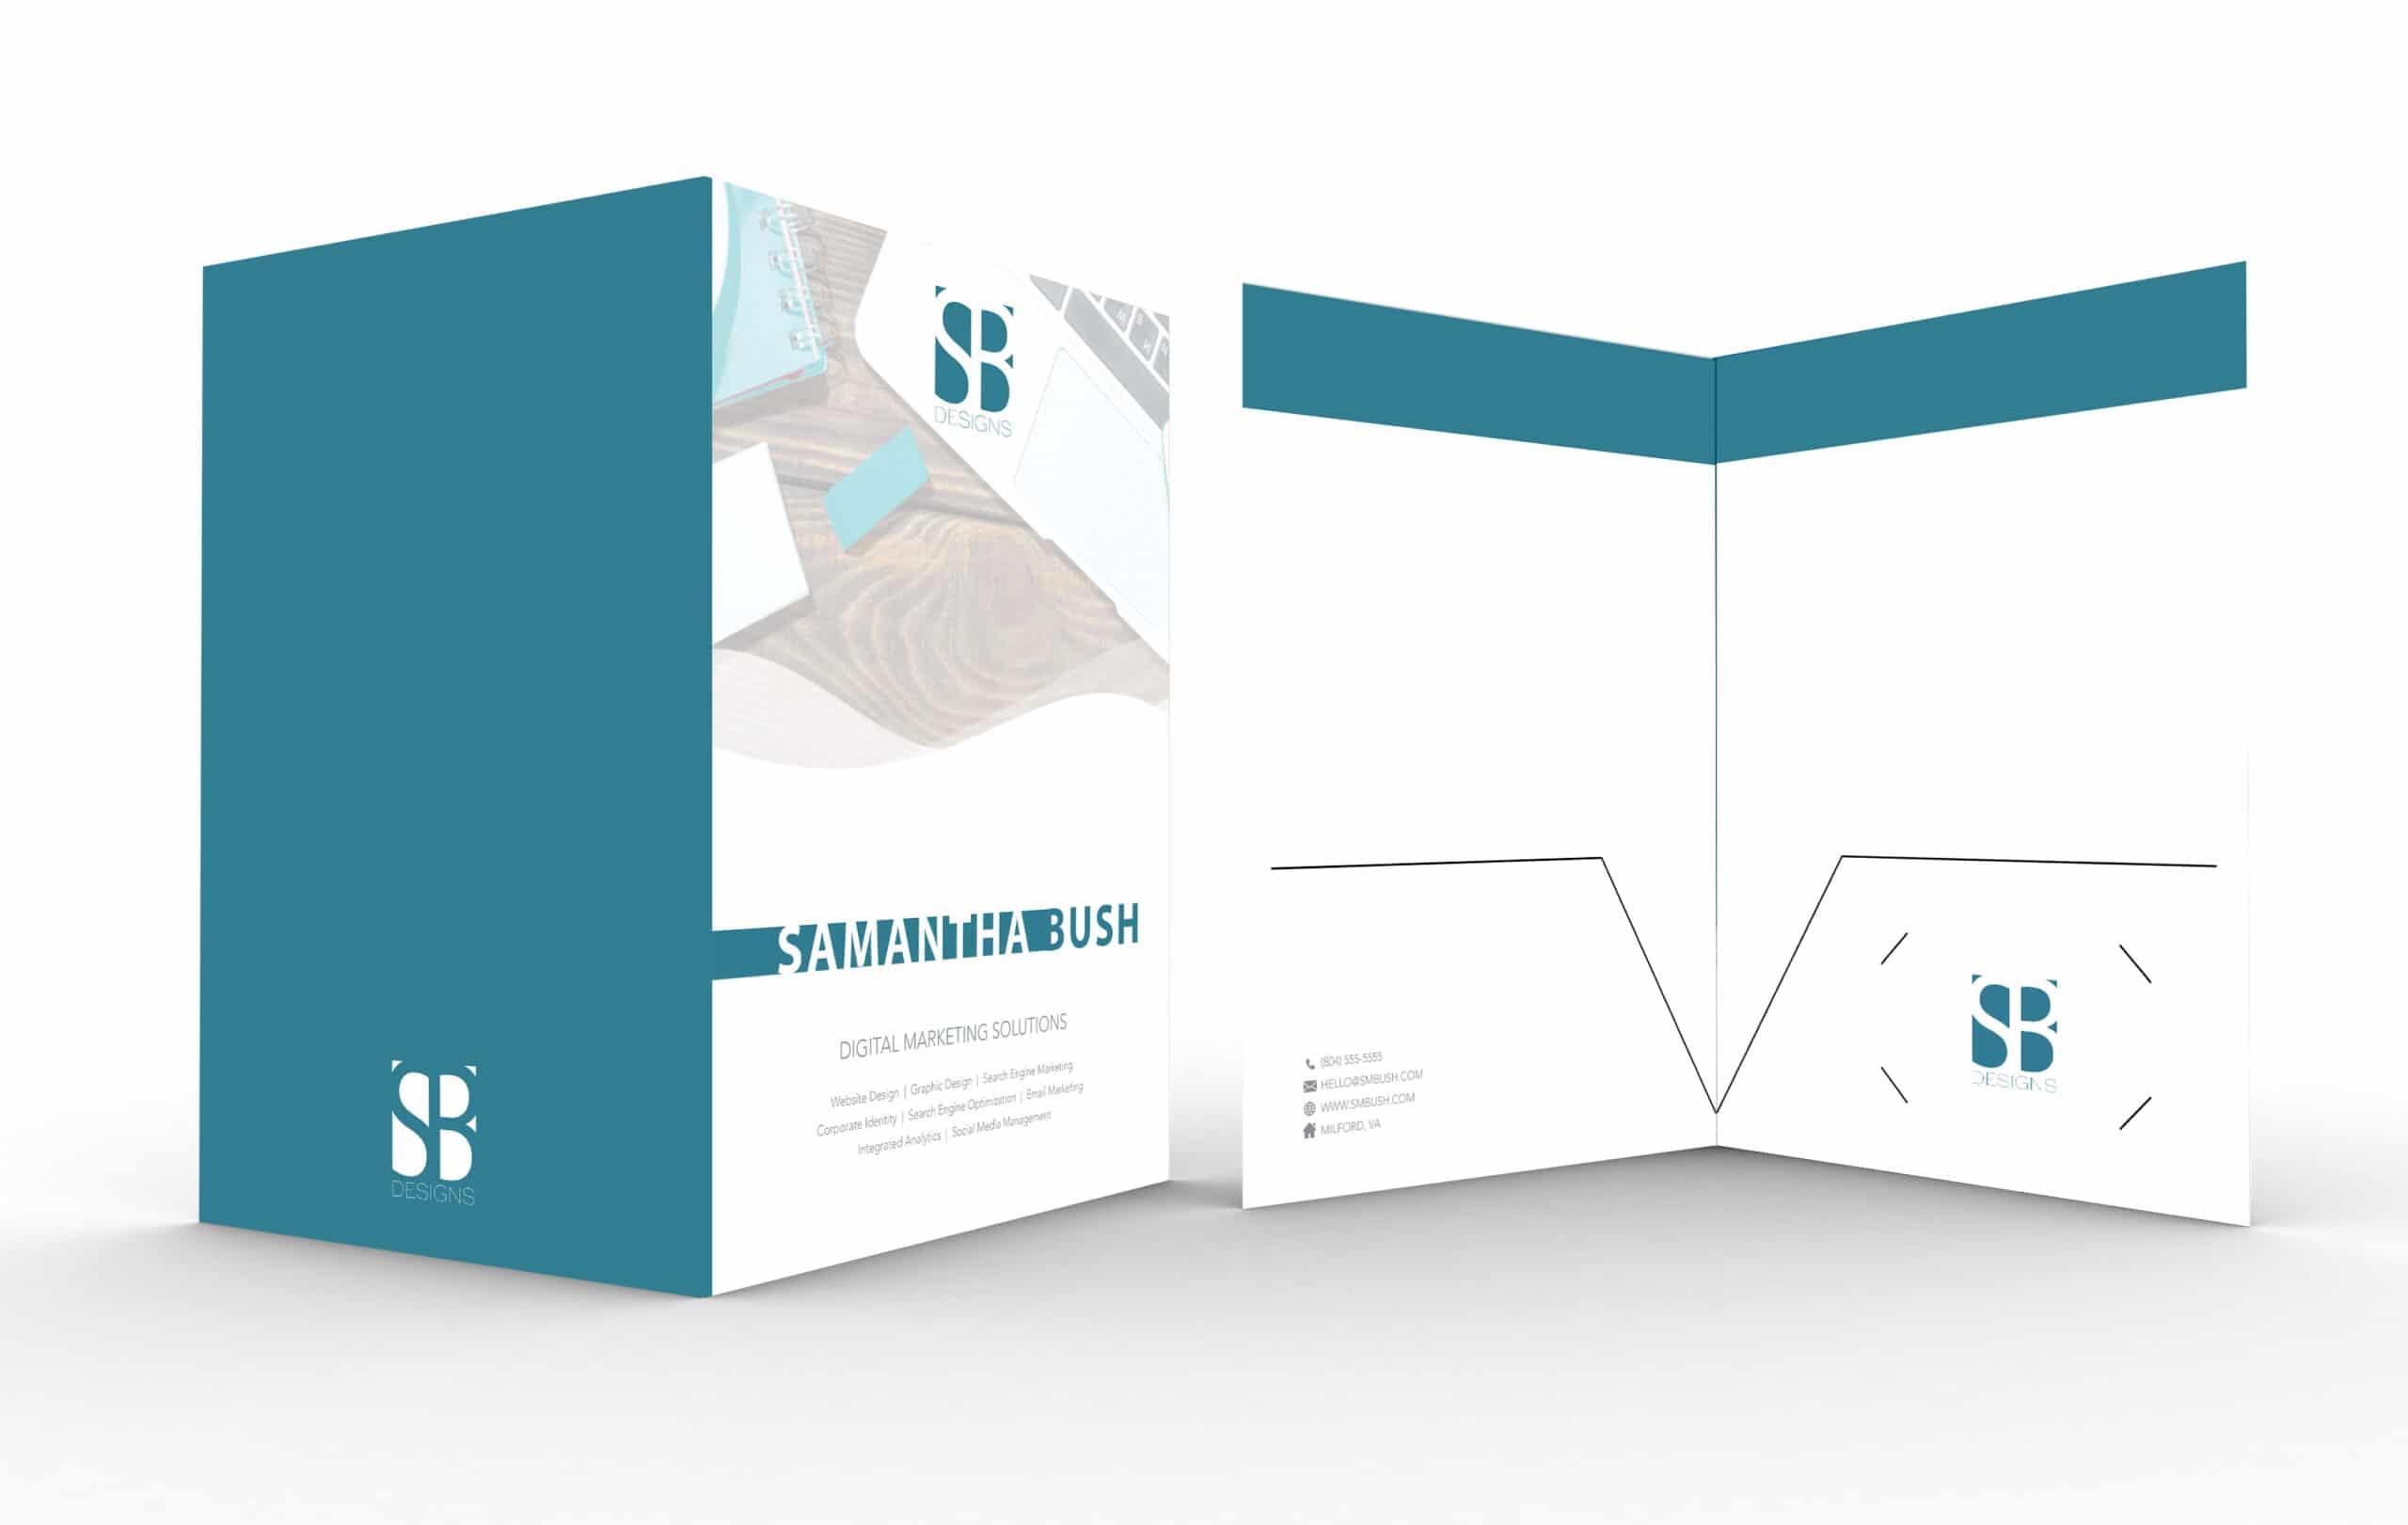 FolderMockup-sbdesigns